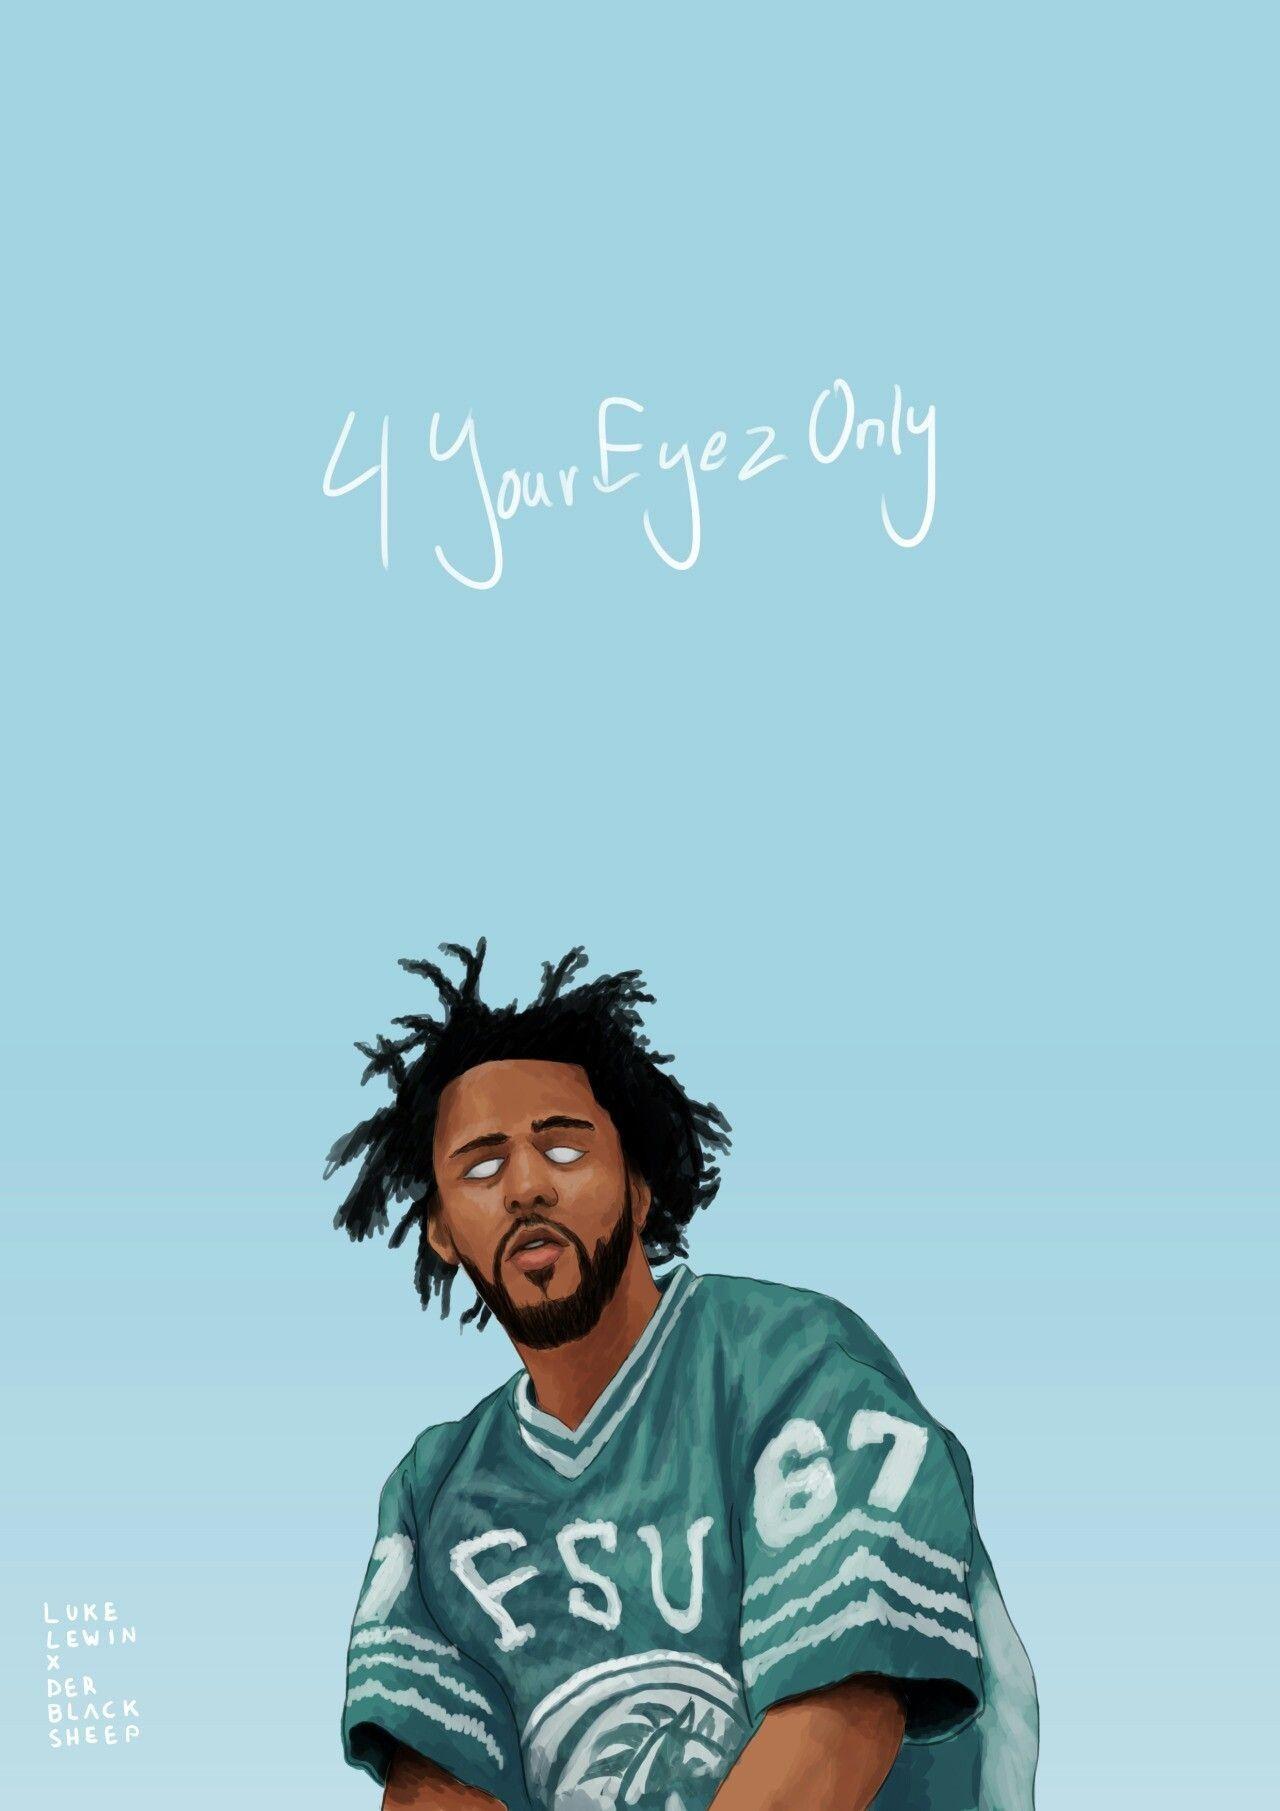 Lovely Rapper Wallpapers For Iphone J Cole J Cole Art Rapper